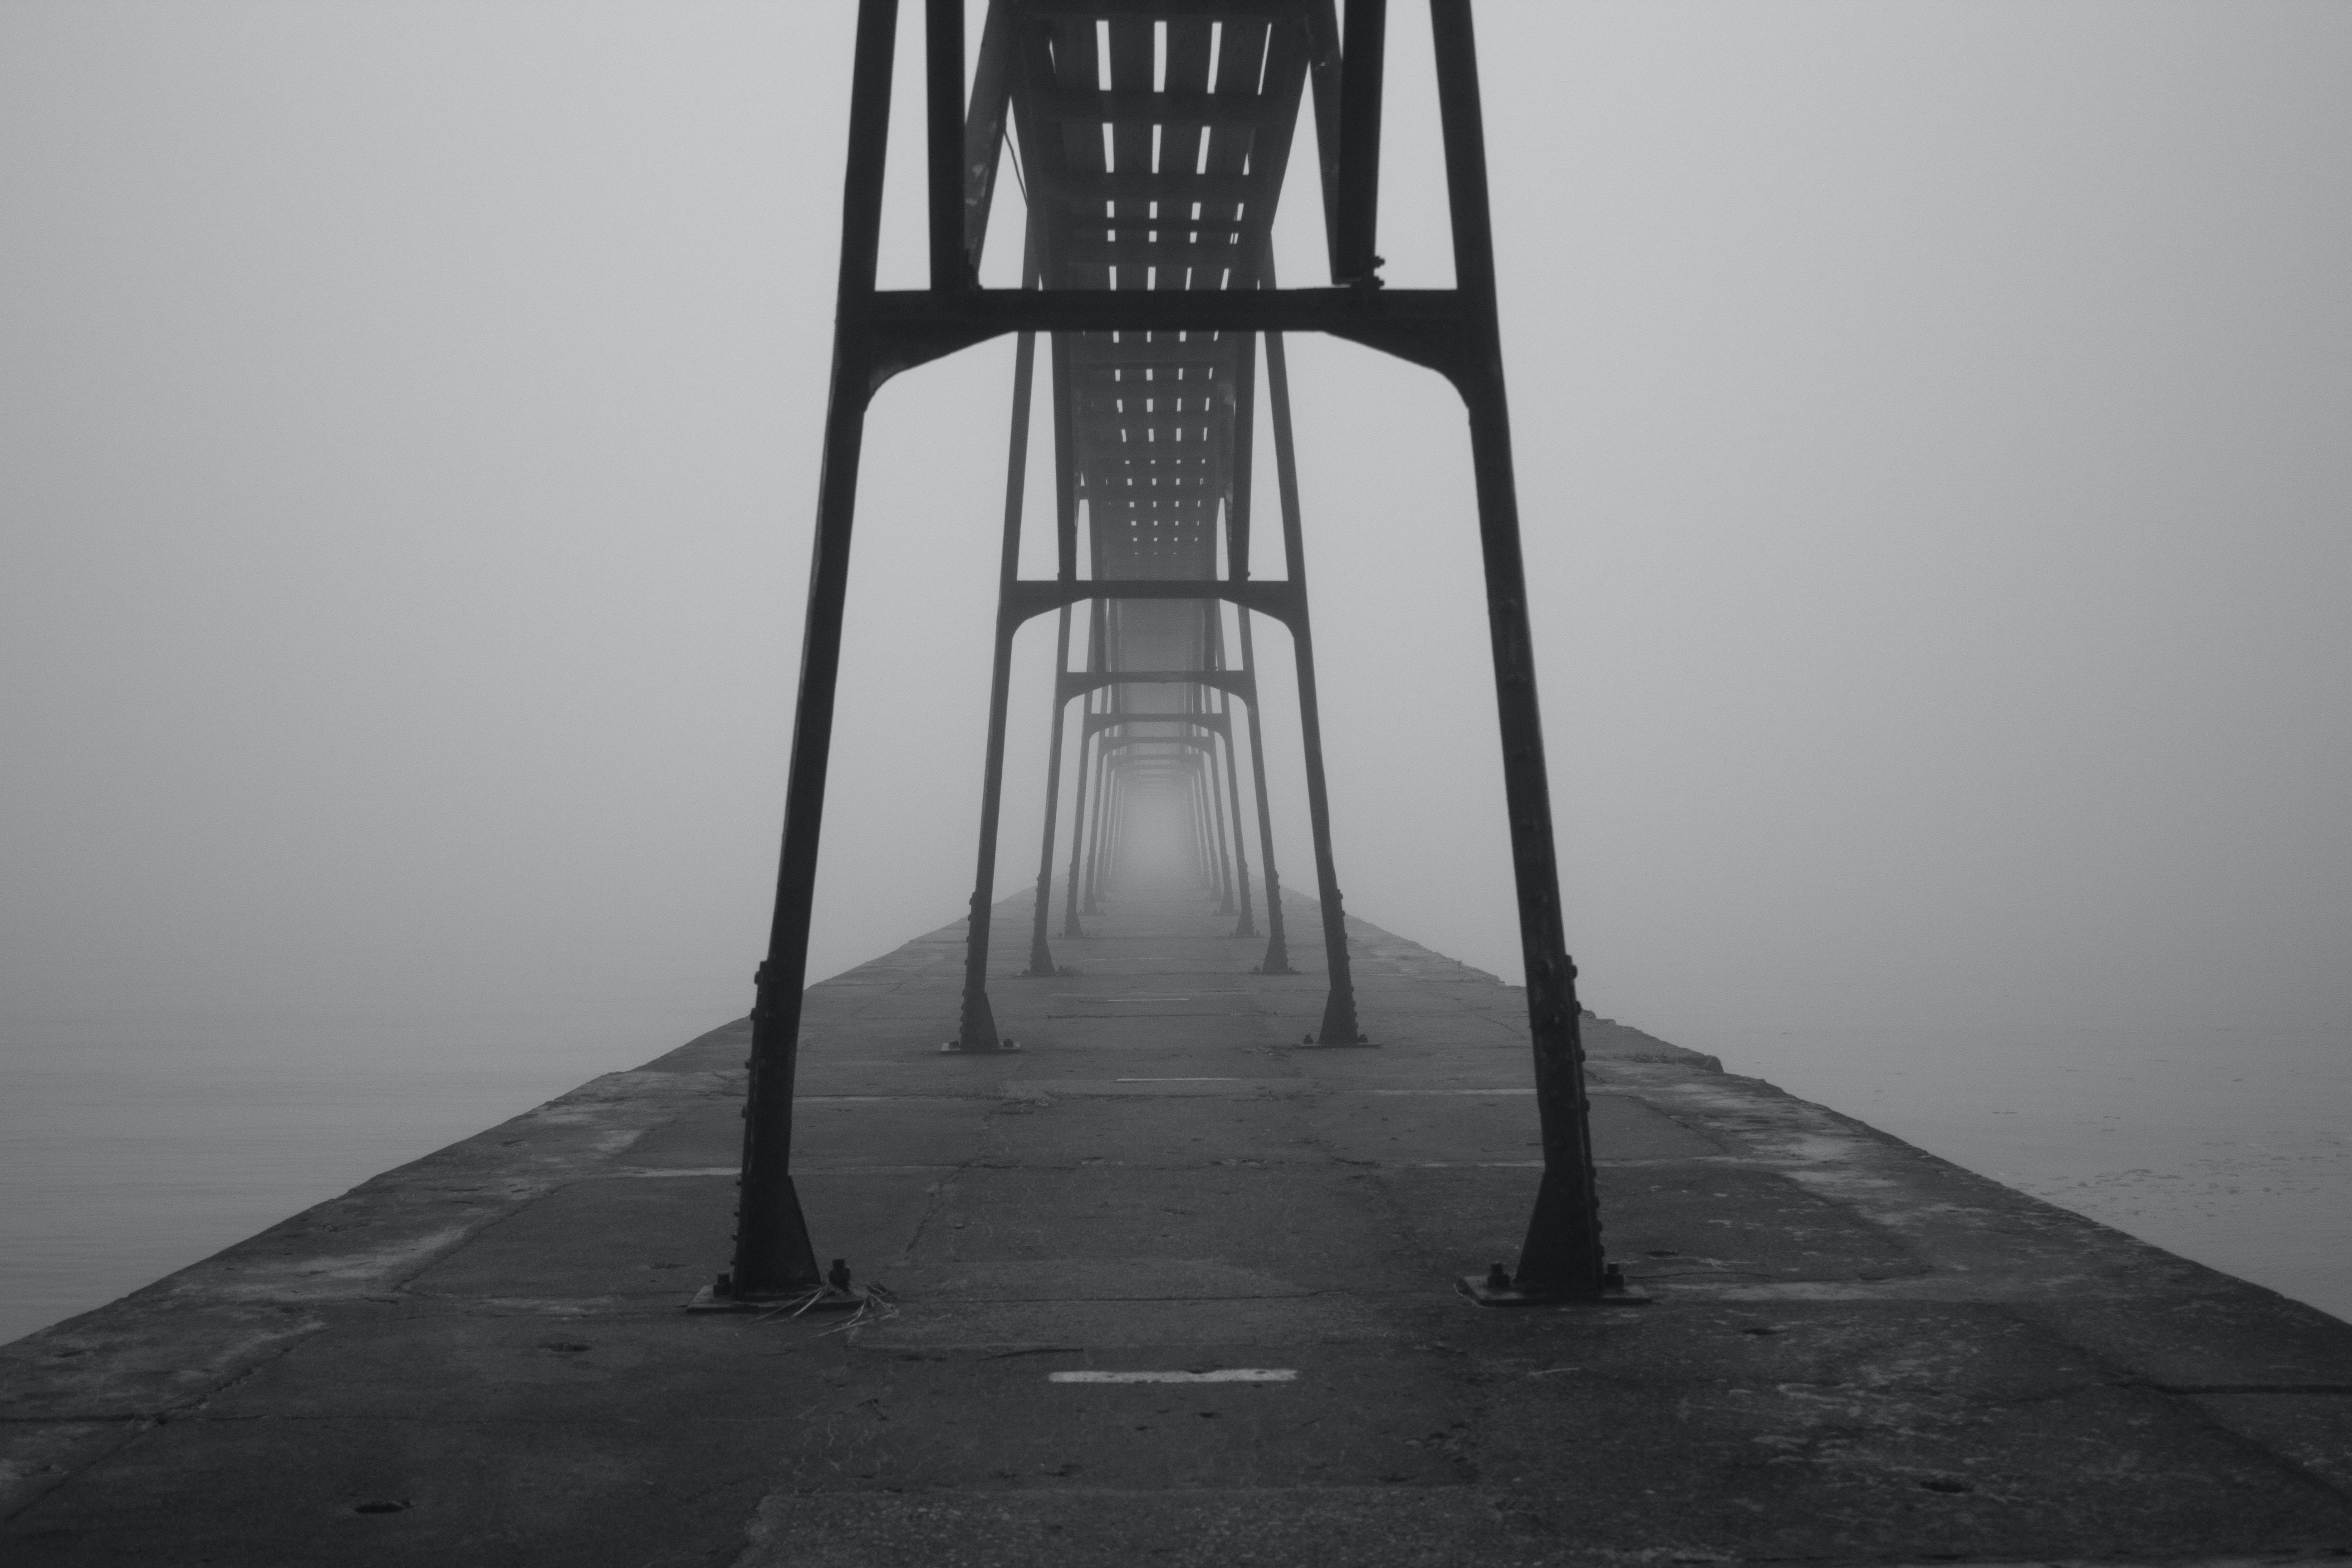 Foggy view of a steel bars on a pier near the ocean